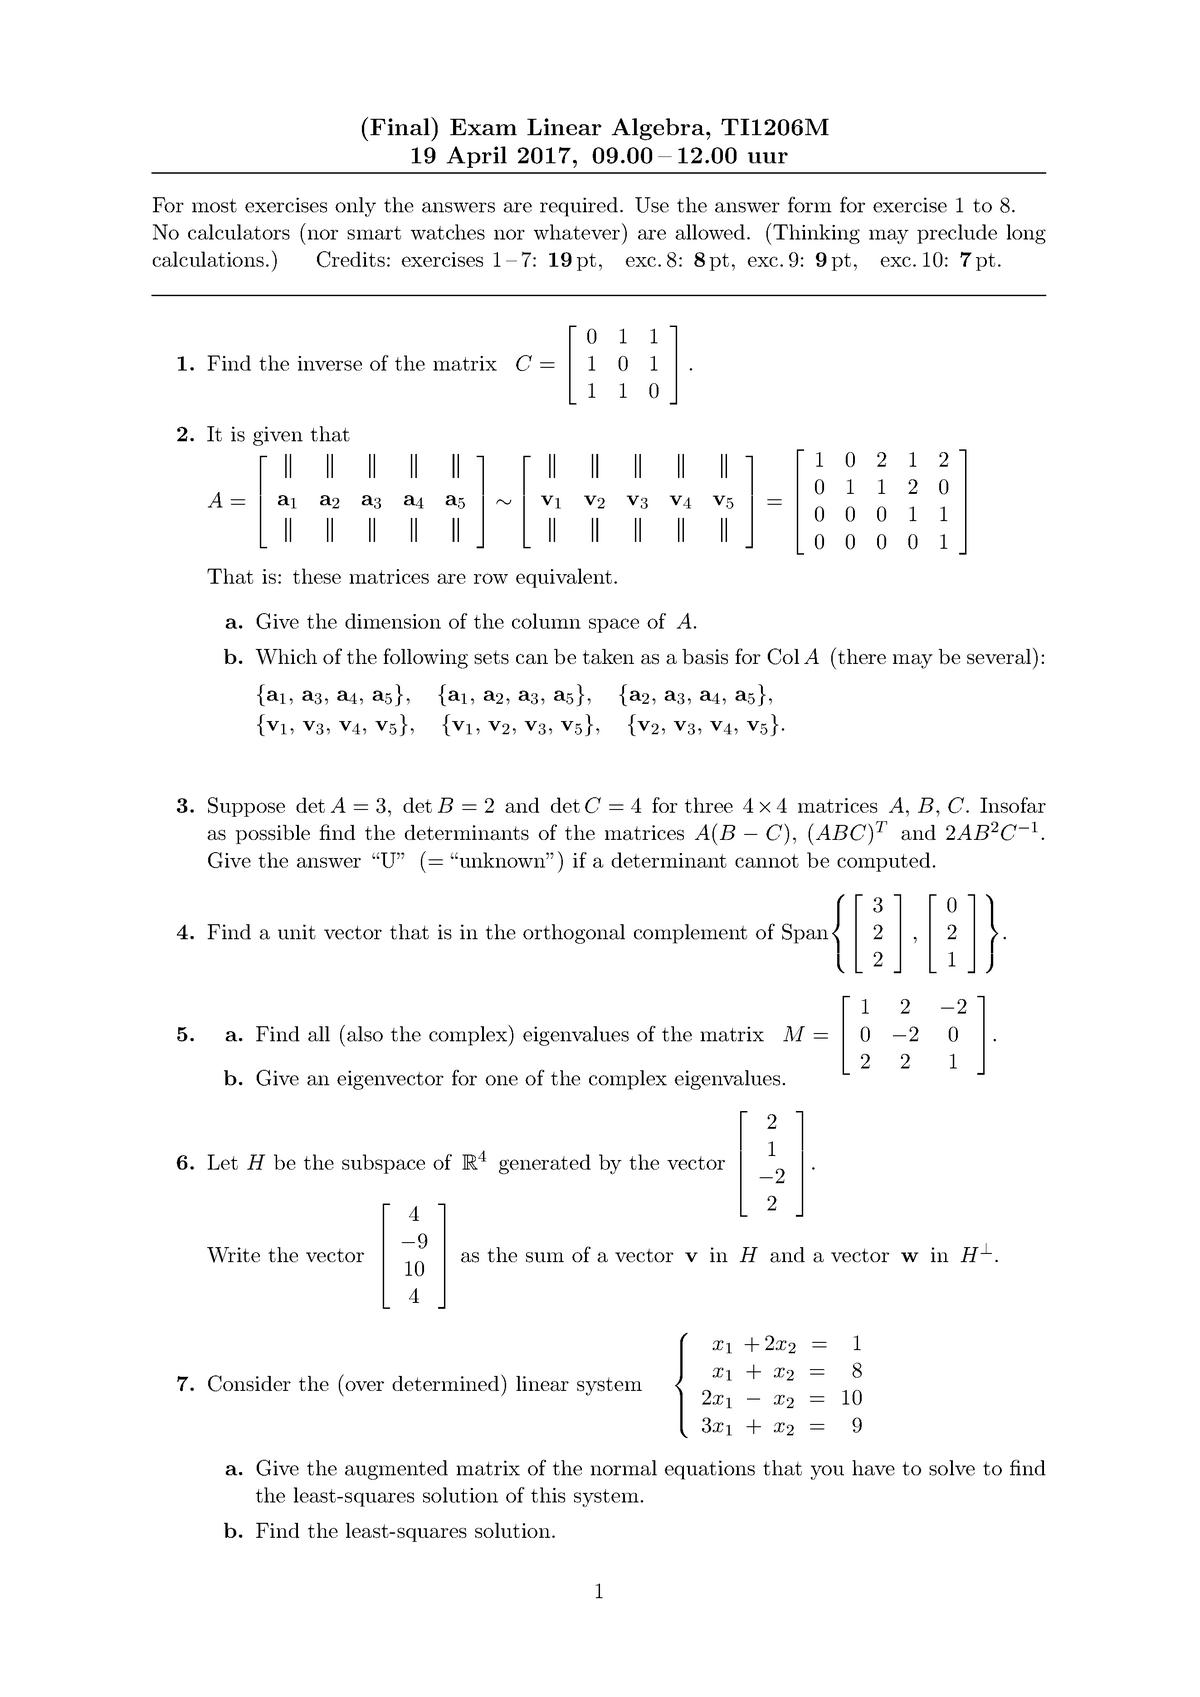 Tentamen 2017 - TI1206M: Linear Algebra - StudeerSnel nl